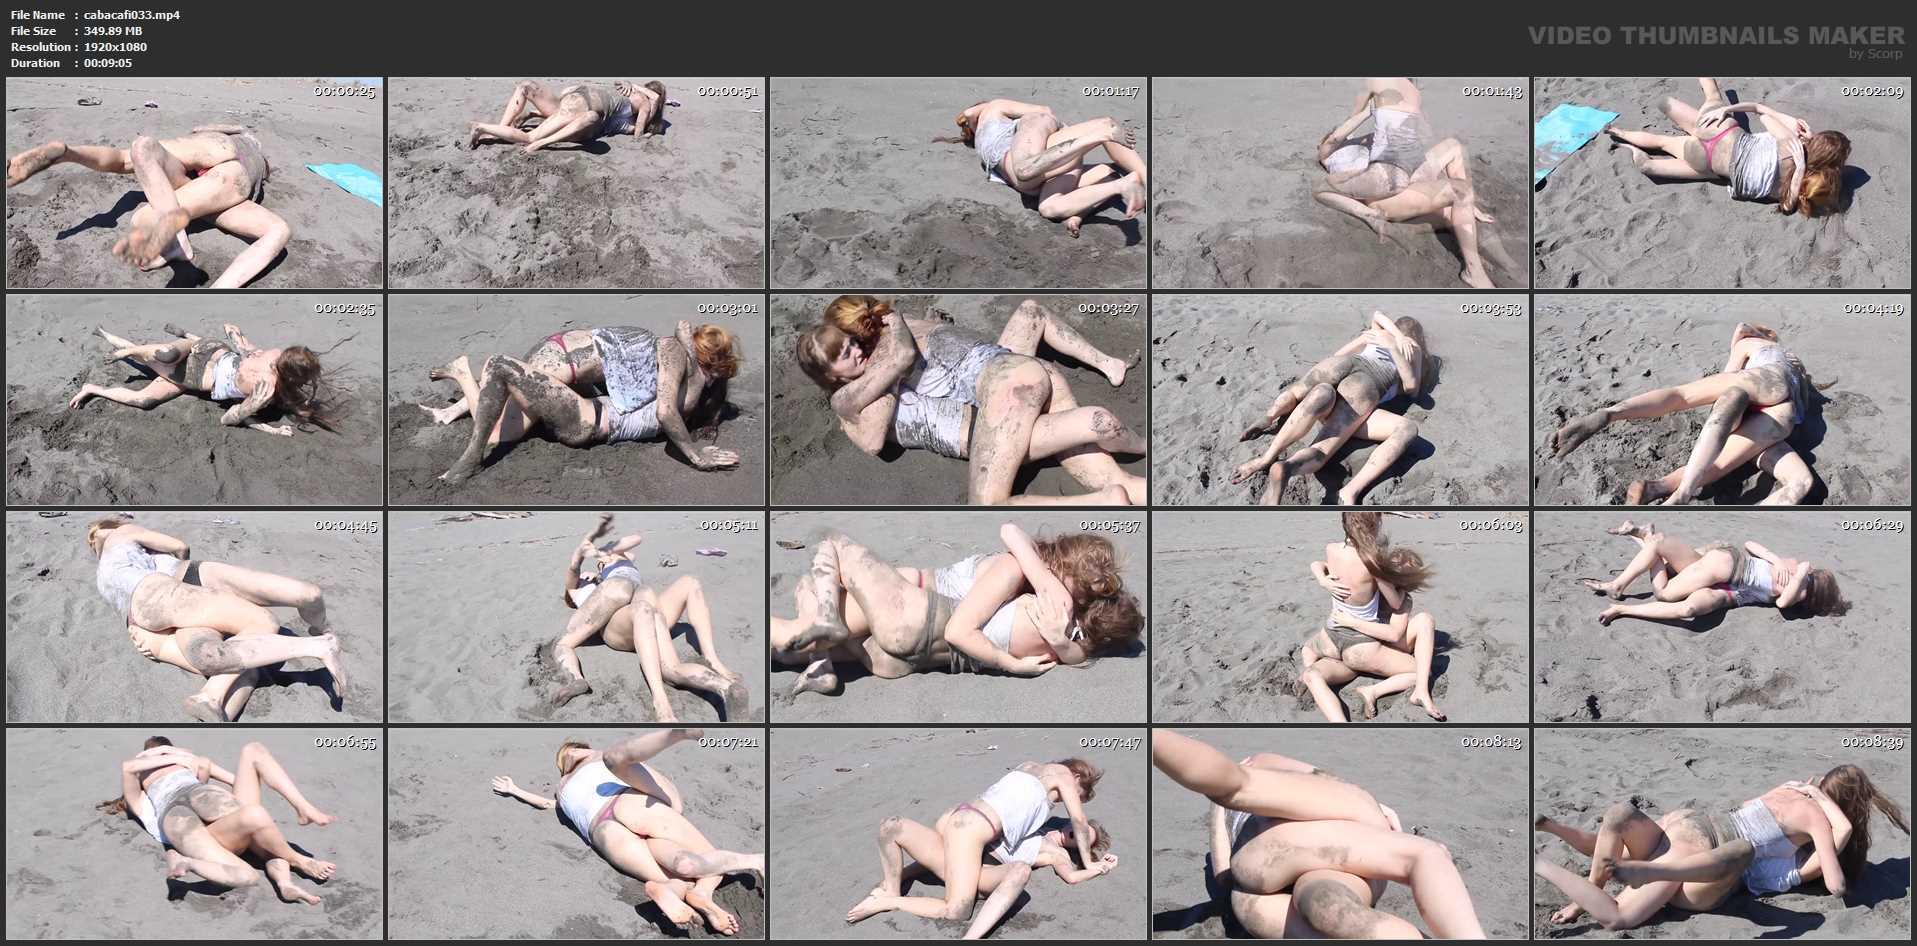 CatBall on the Beach Part 2 - CATBALL CATFIGHT AND SEXFIGHT - FULL HD/1080p/MP4